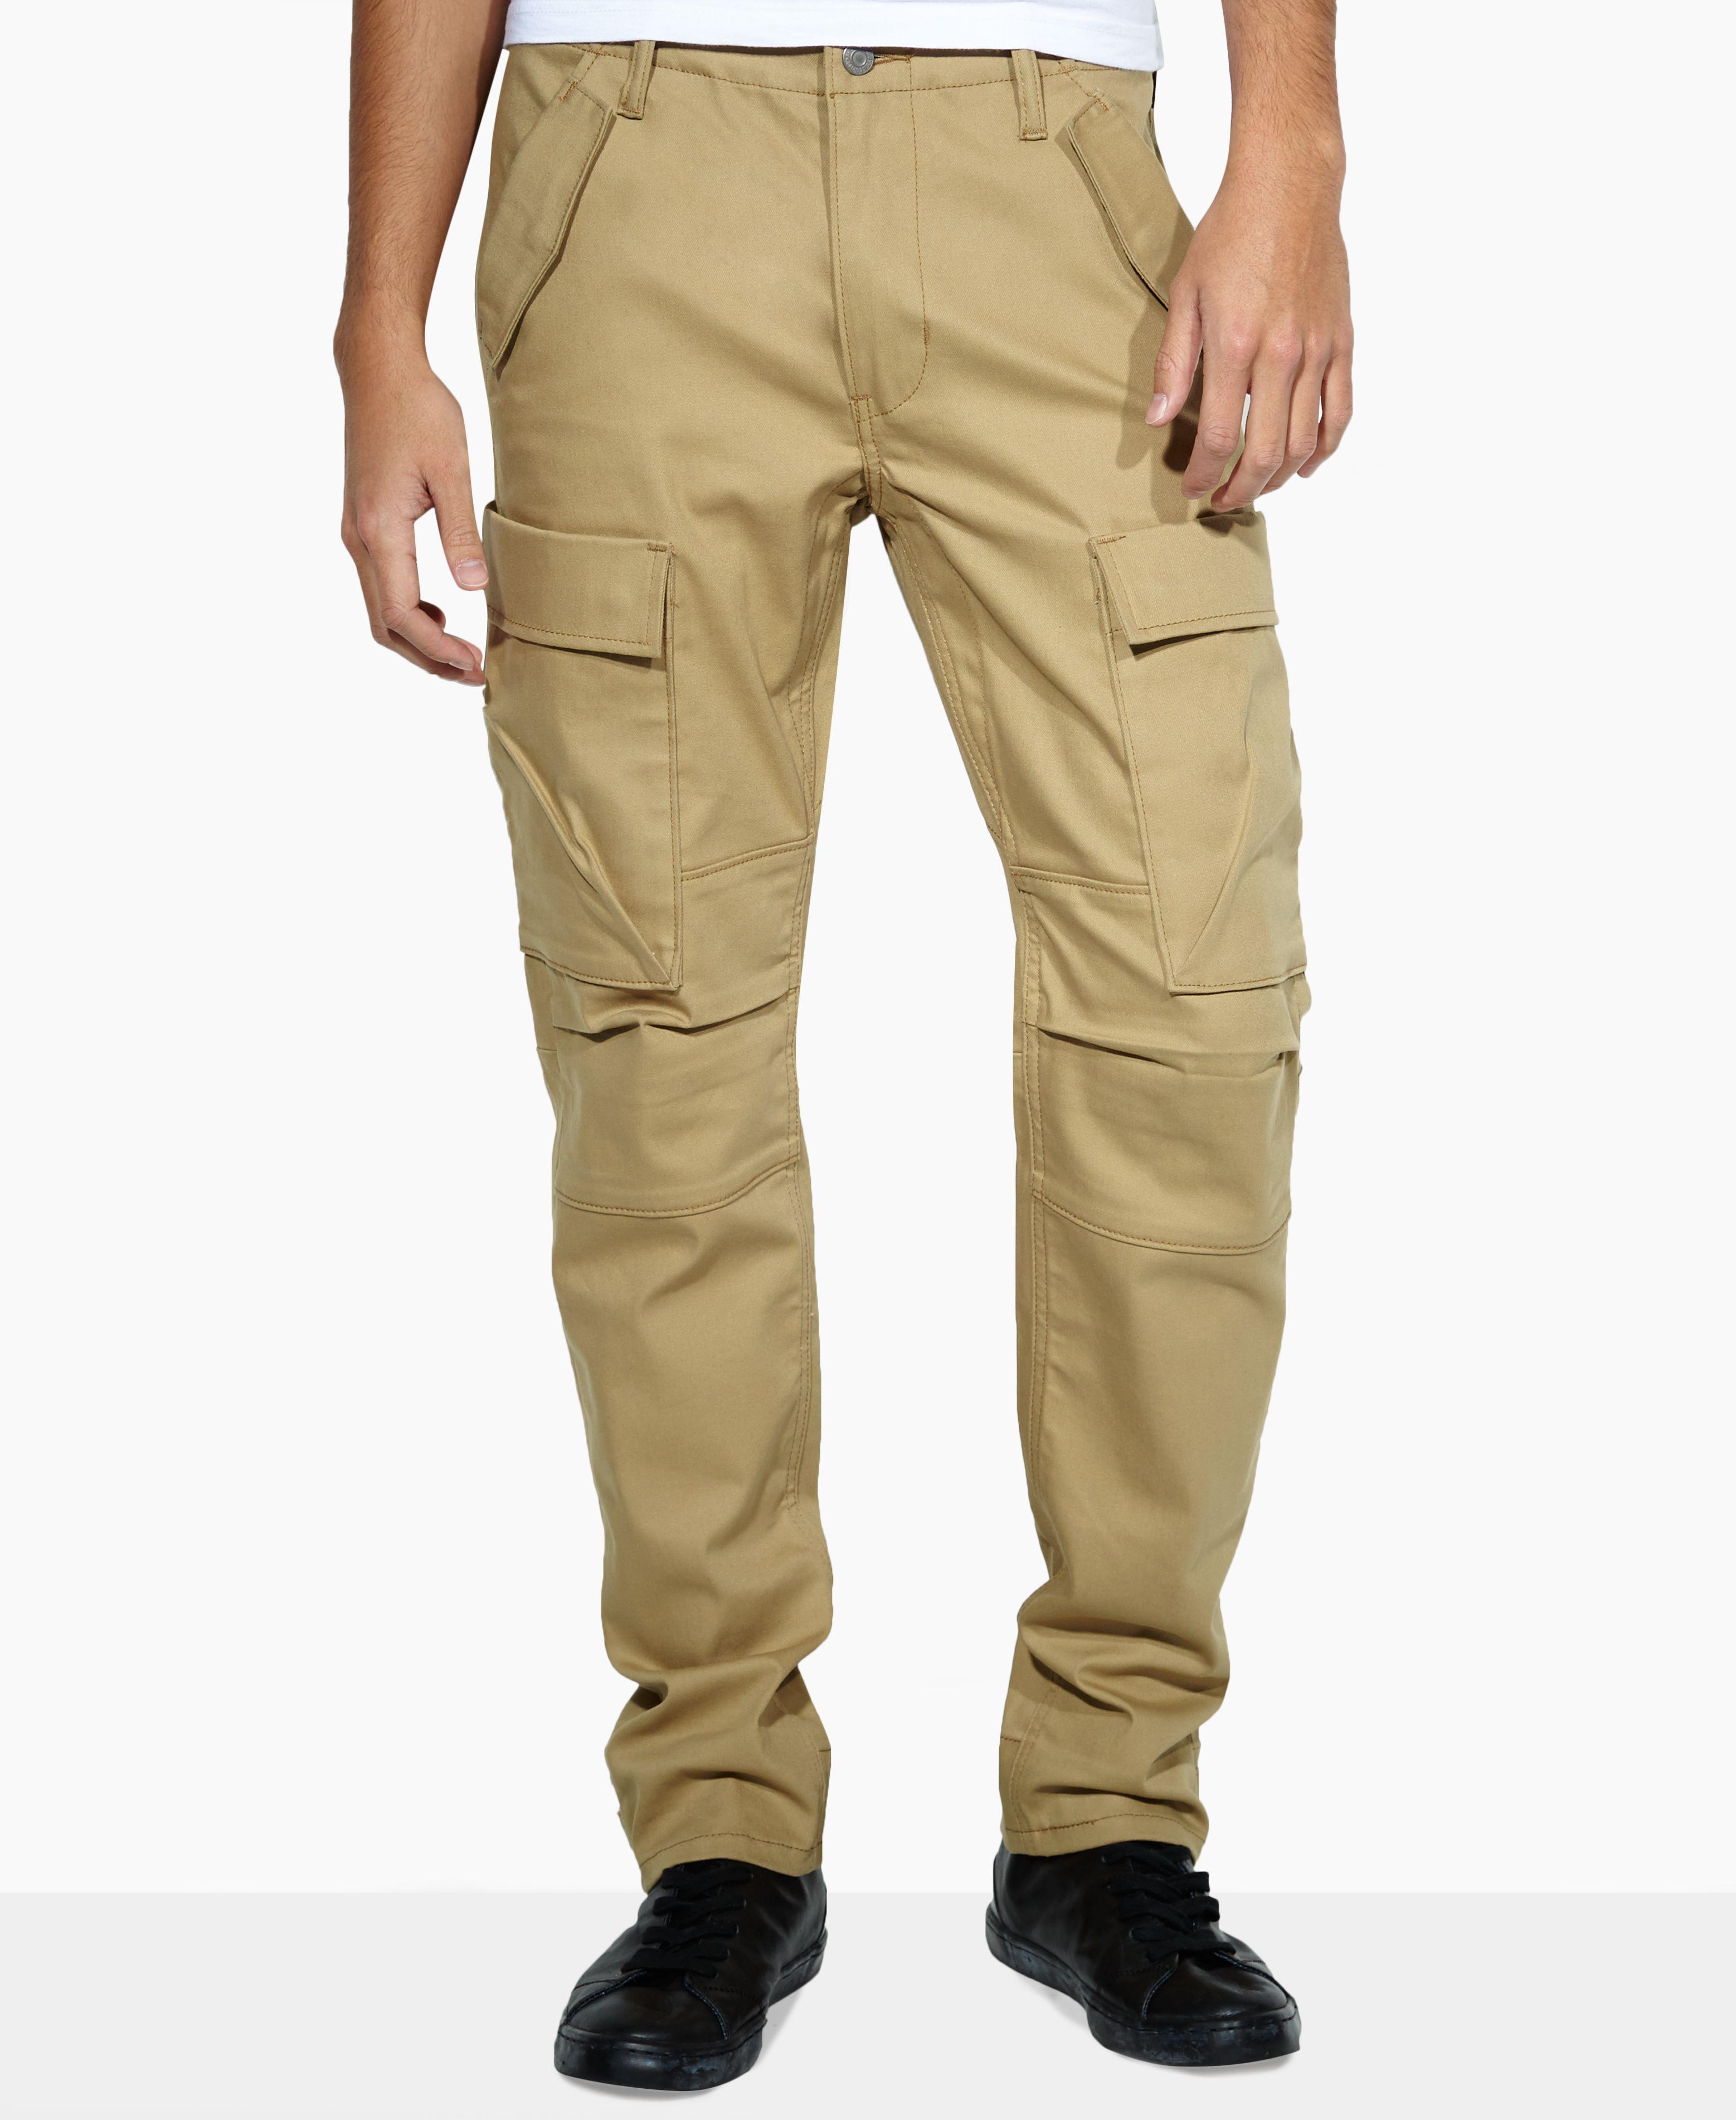 405a0196 Levi's Commuter Harvest Gold Commuter Cargo Pants | Products ...